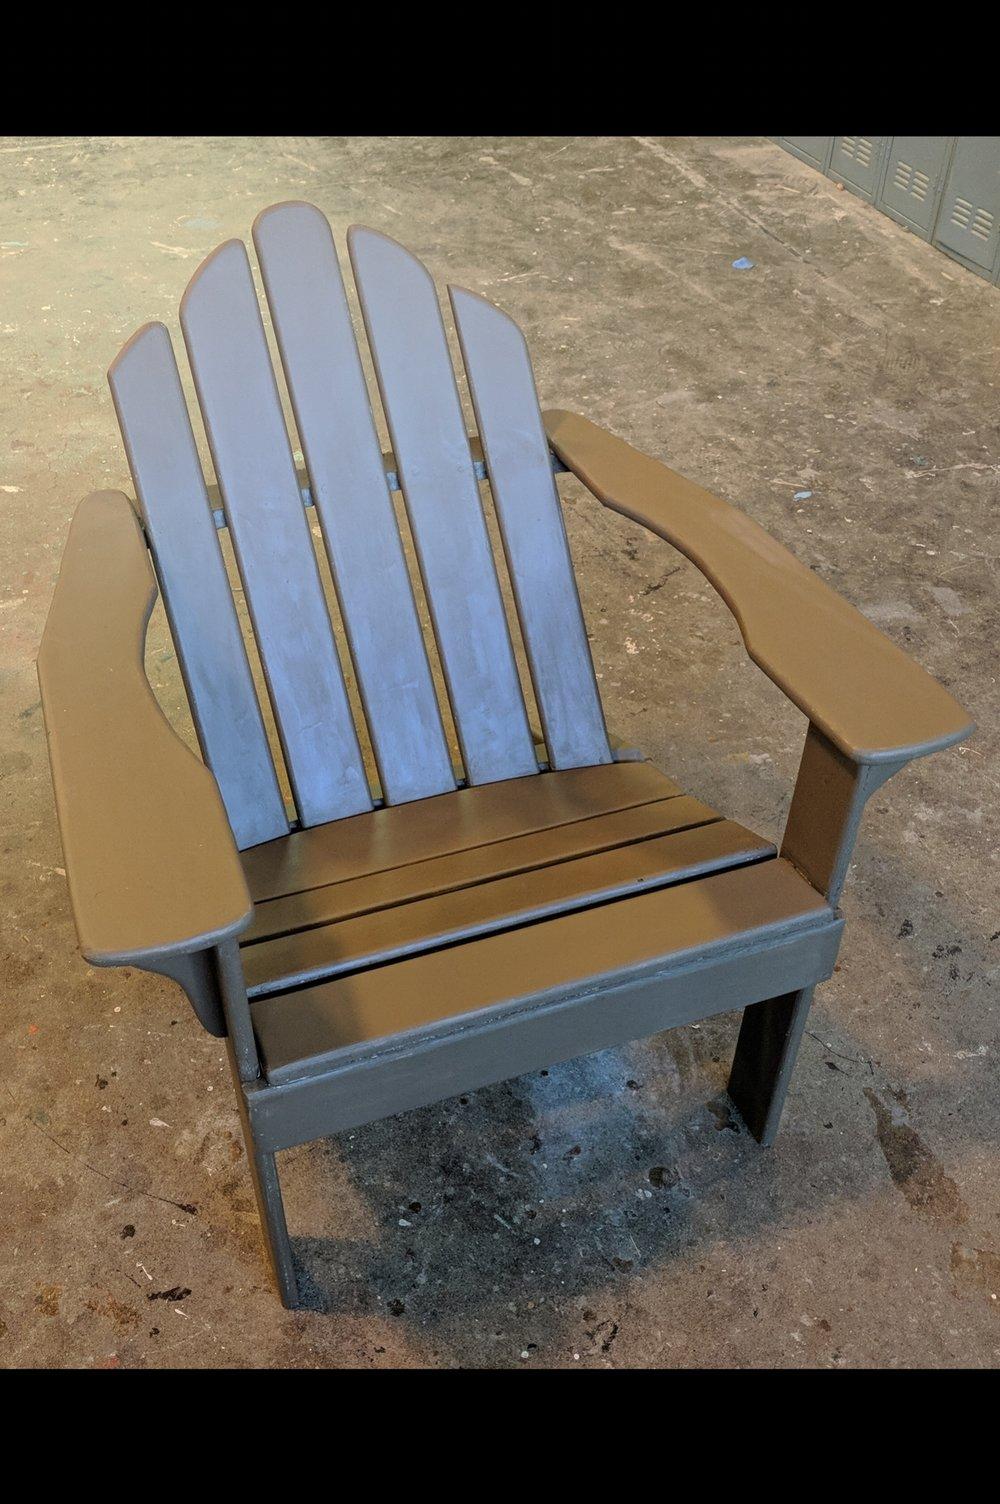 Trenton's Chair 2.jpg